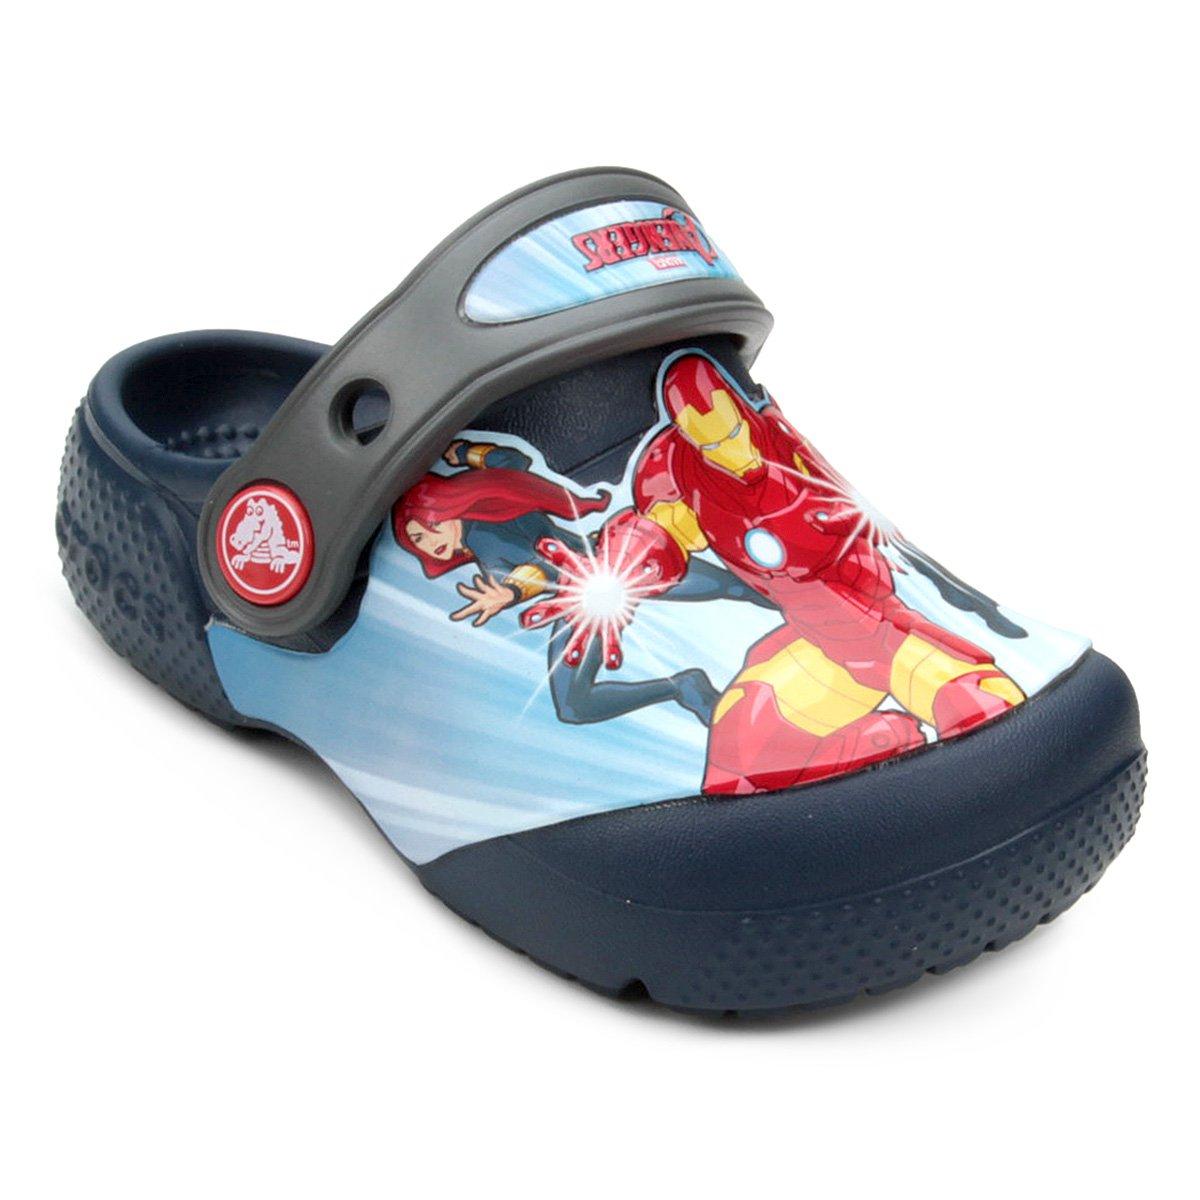 50878a383 Sandália Crocs Os Vingadores